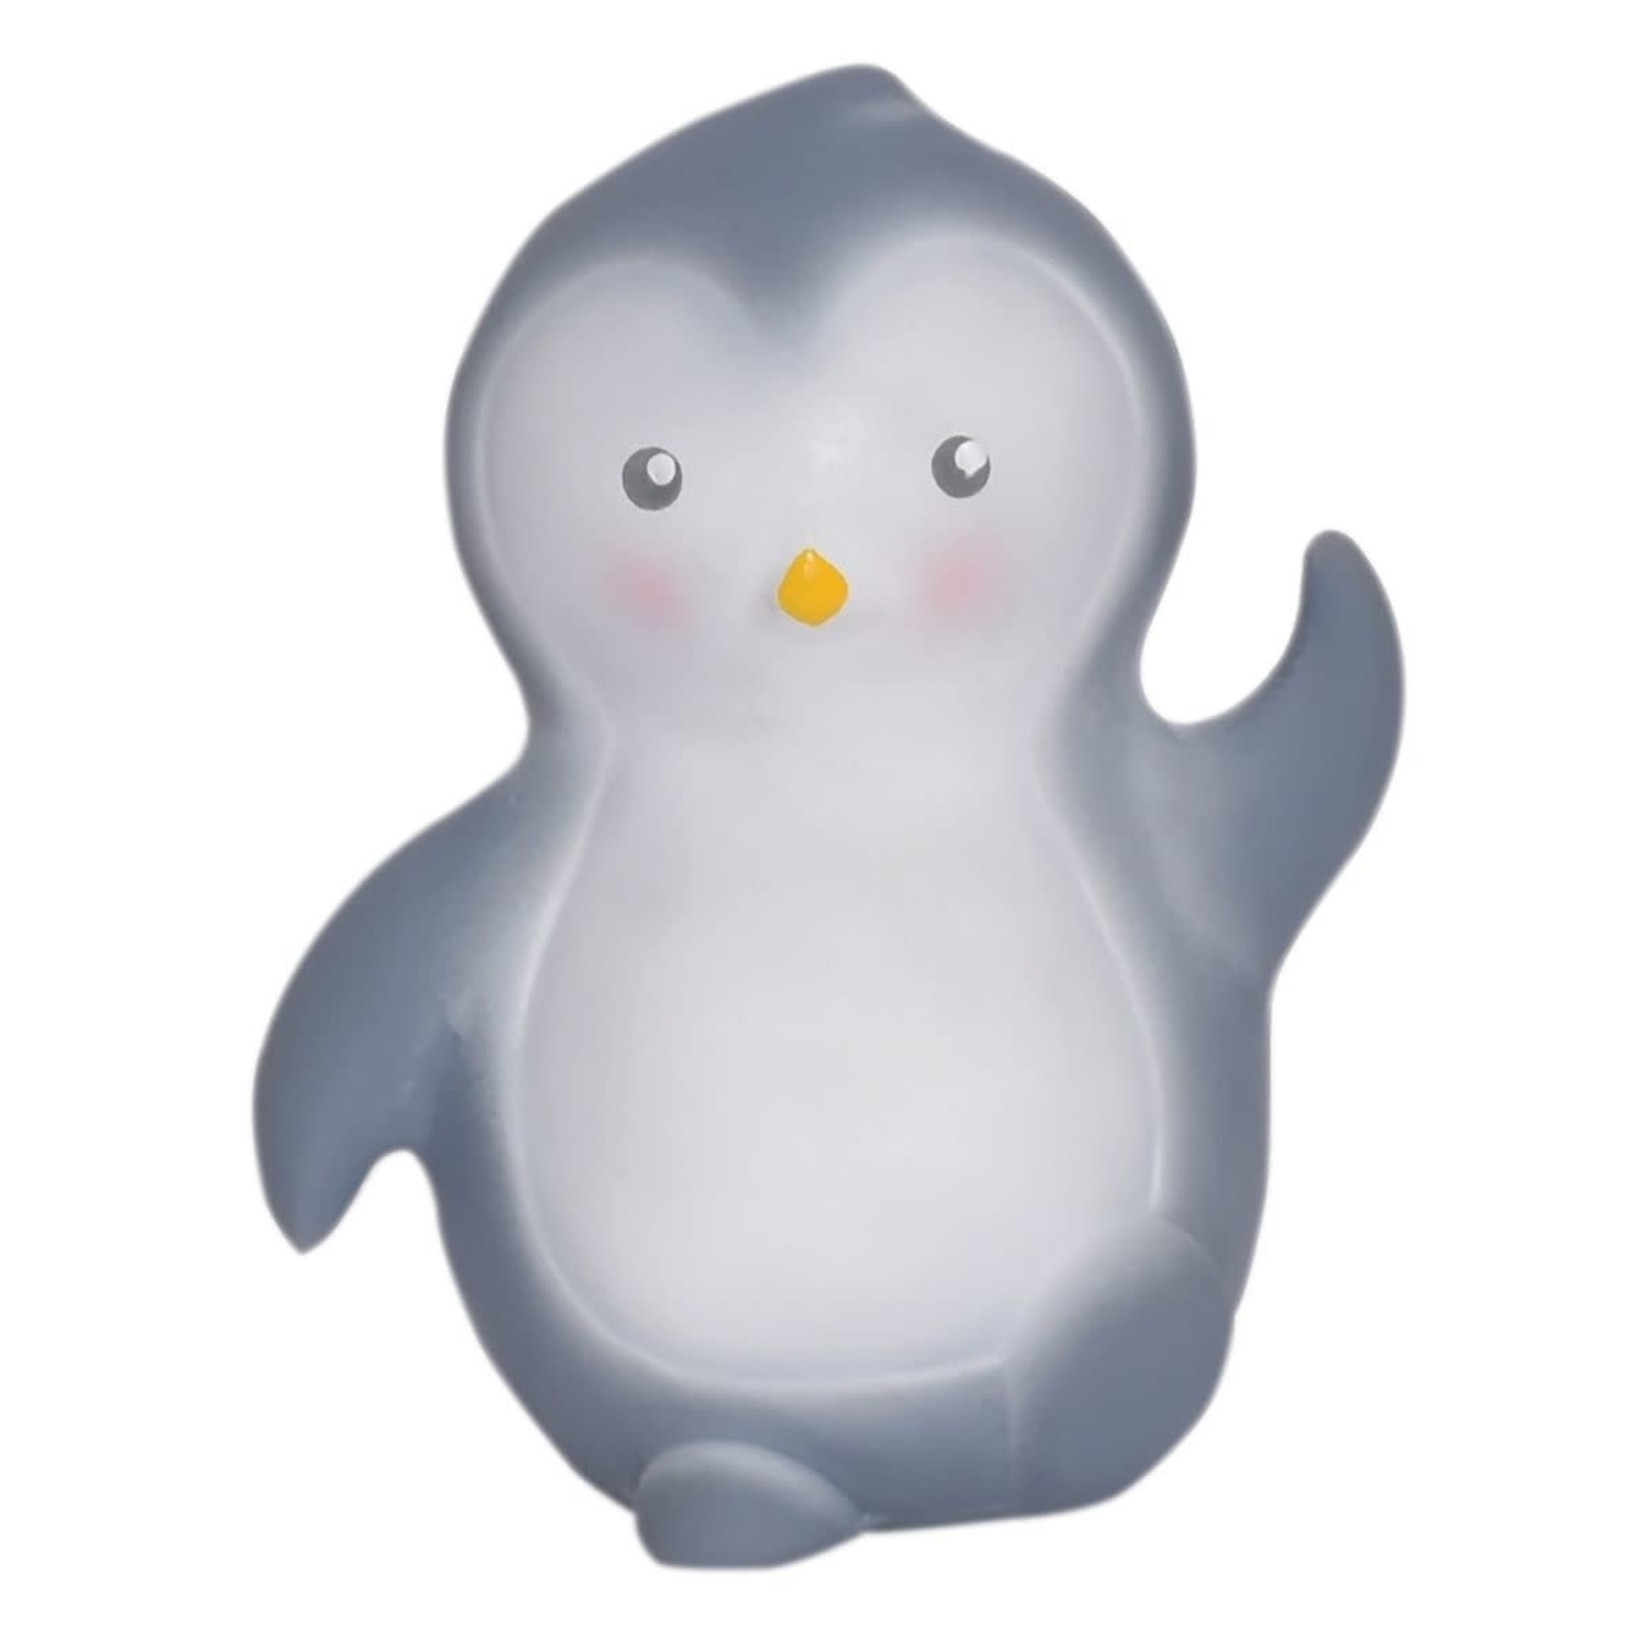 Tikiri Mijn eerste Pooldiertje (Pinguïn)